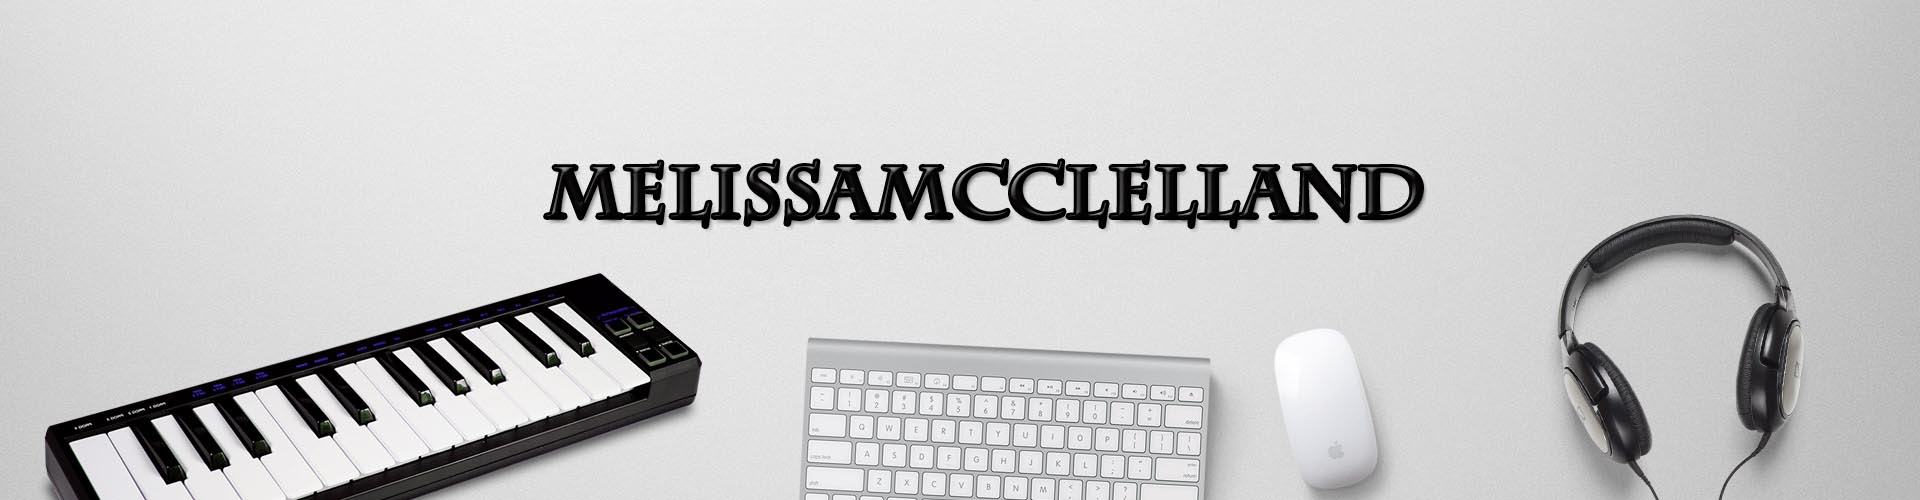 melissamcclelland-header-top